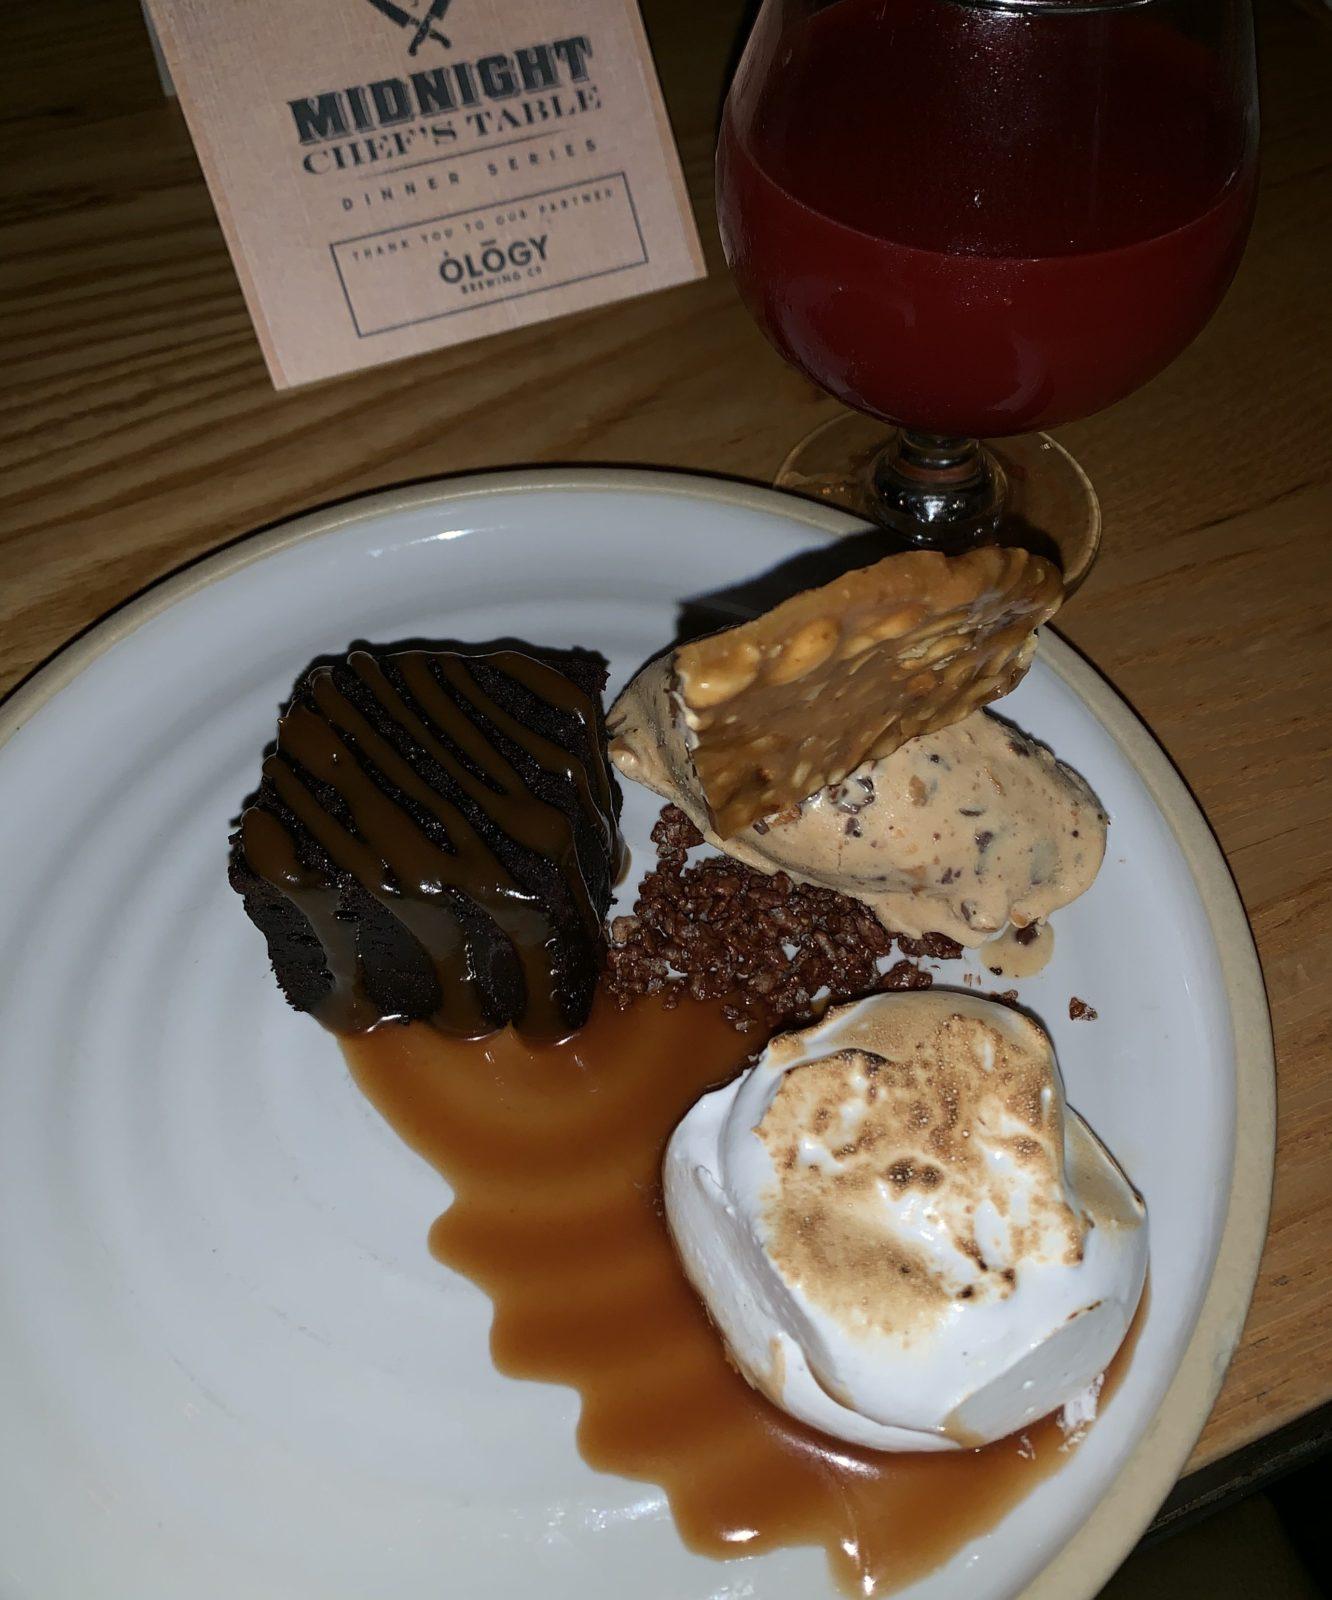 Yardbird Dinner Series